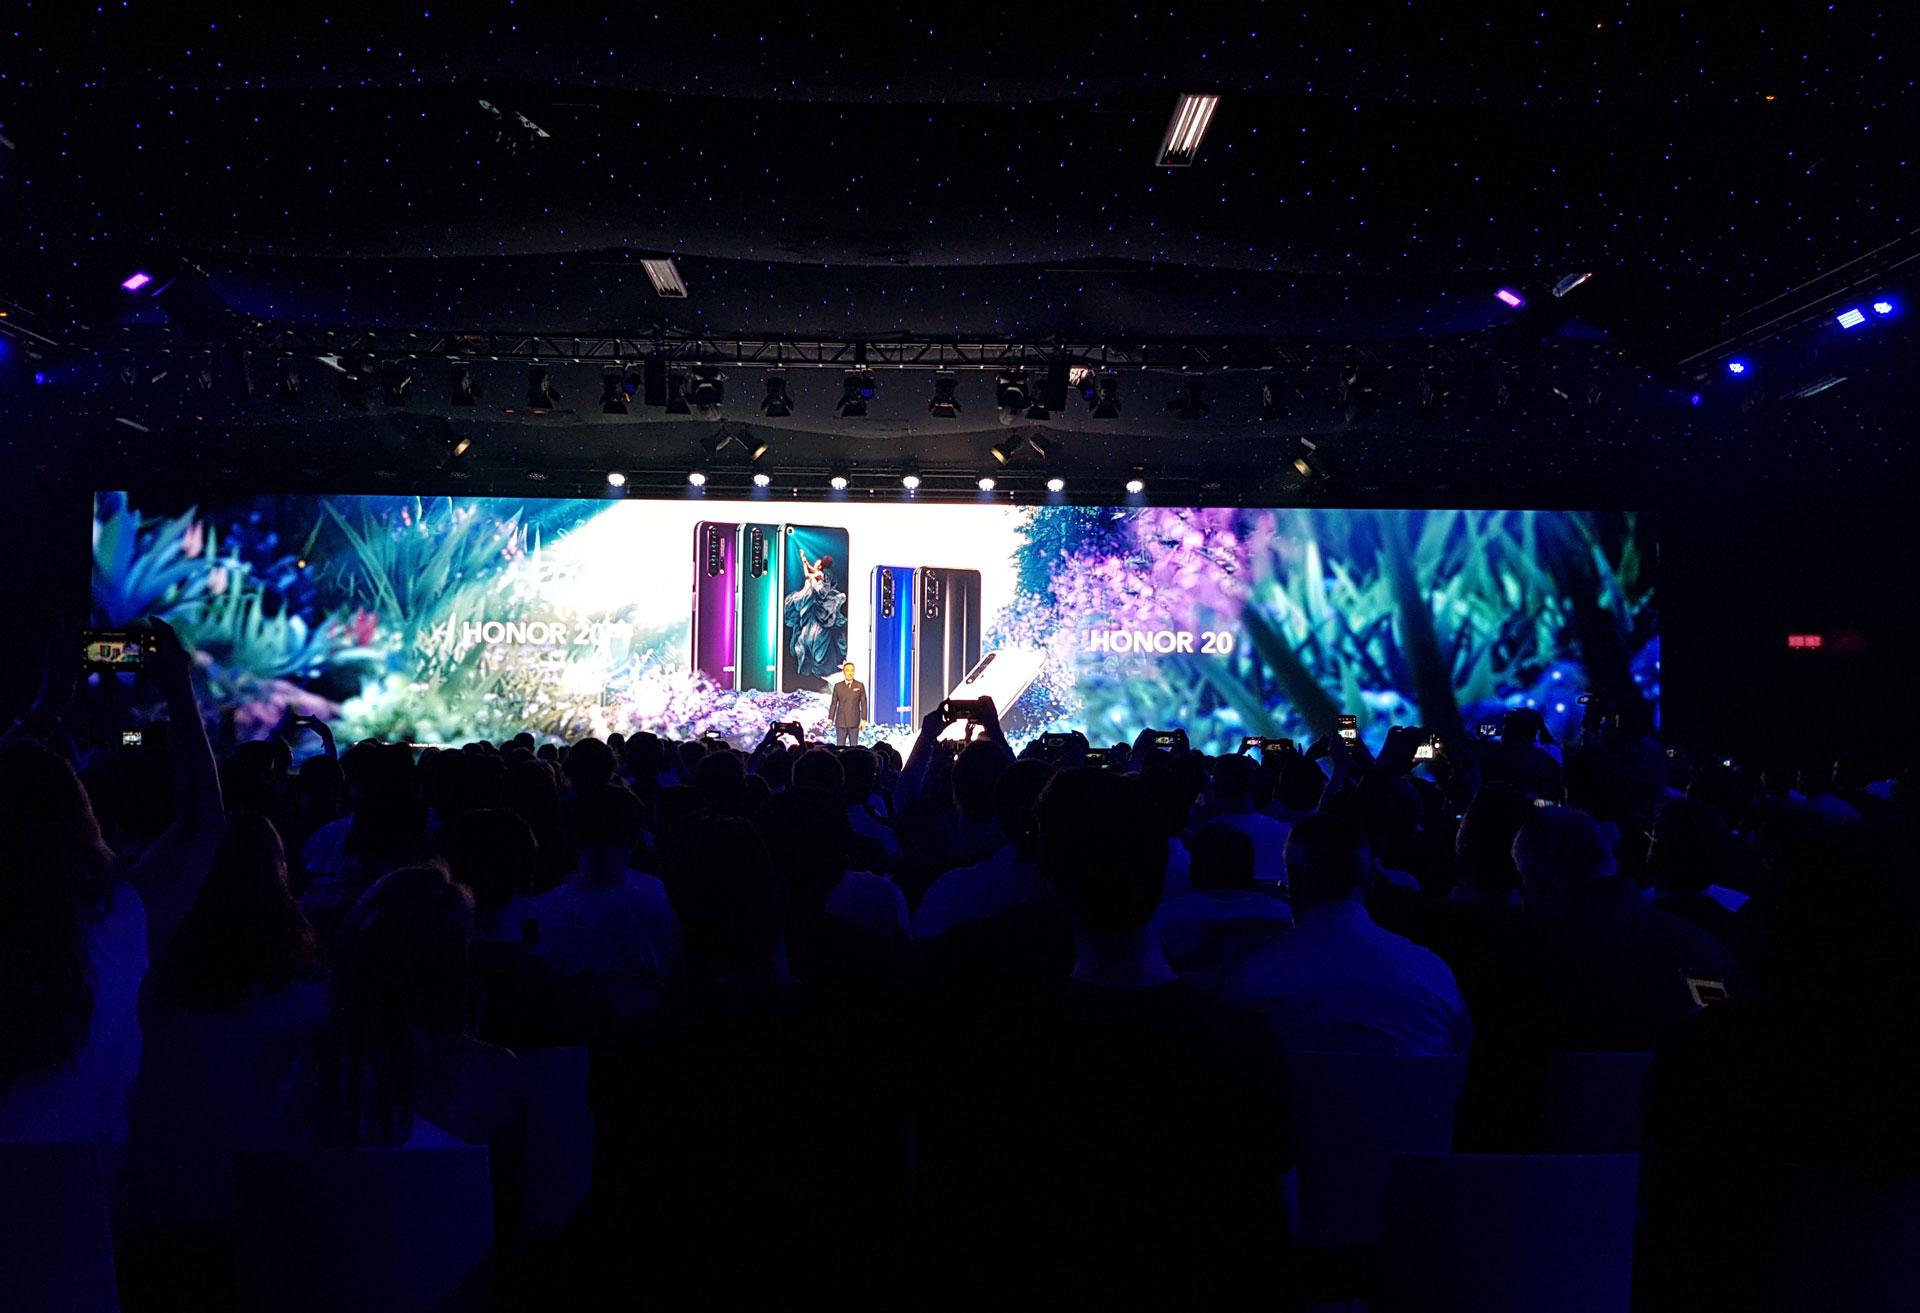 Honor 20's impressive specs fail to bolster Huawei's reputation